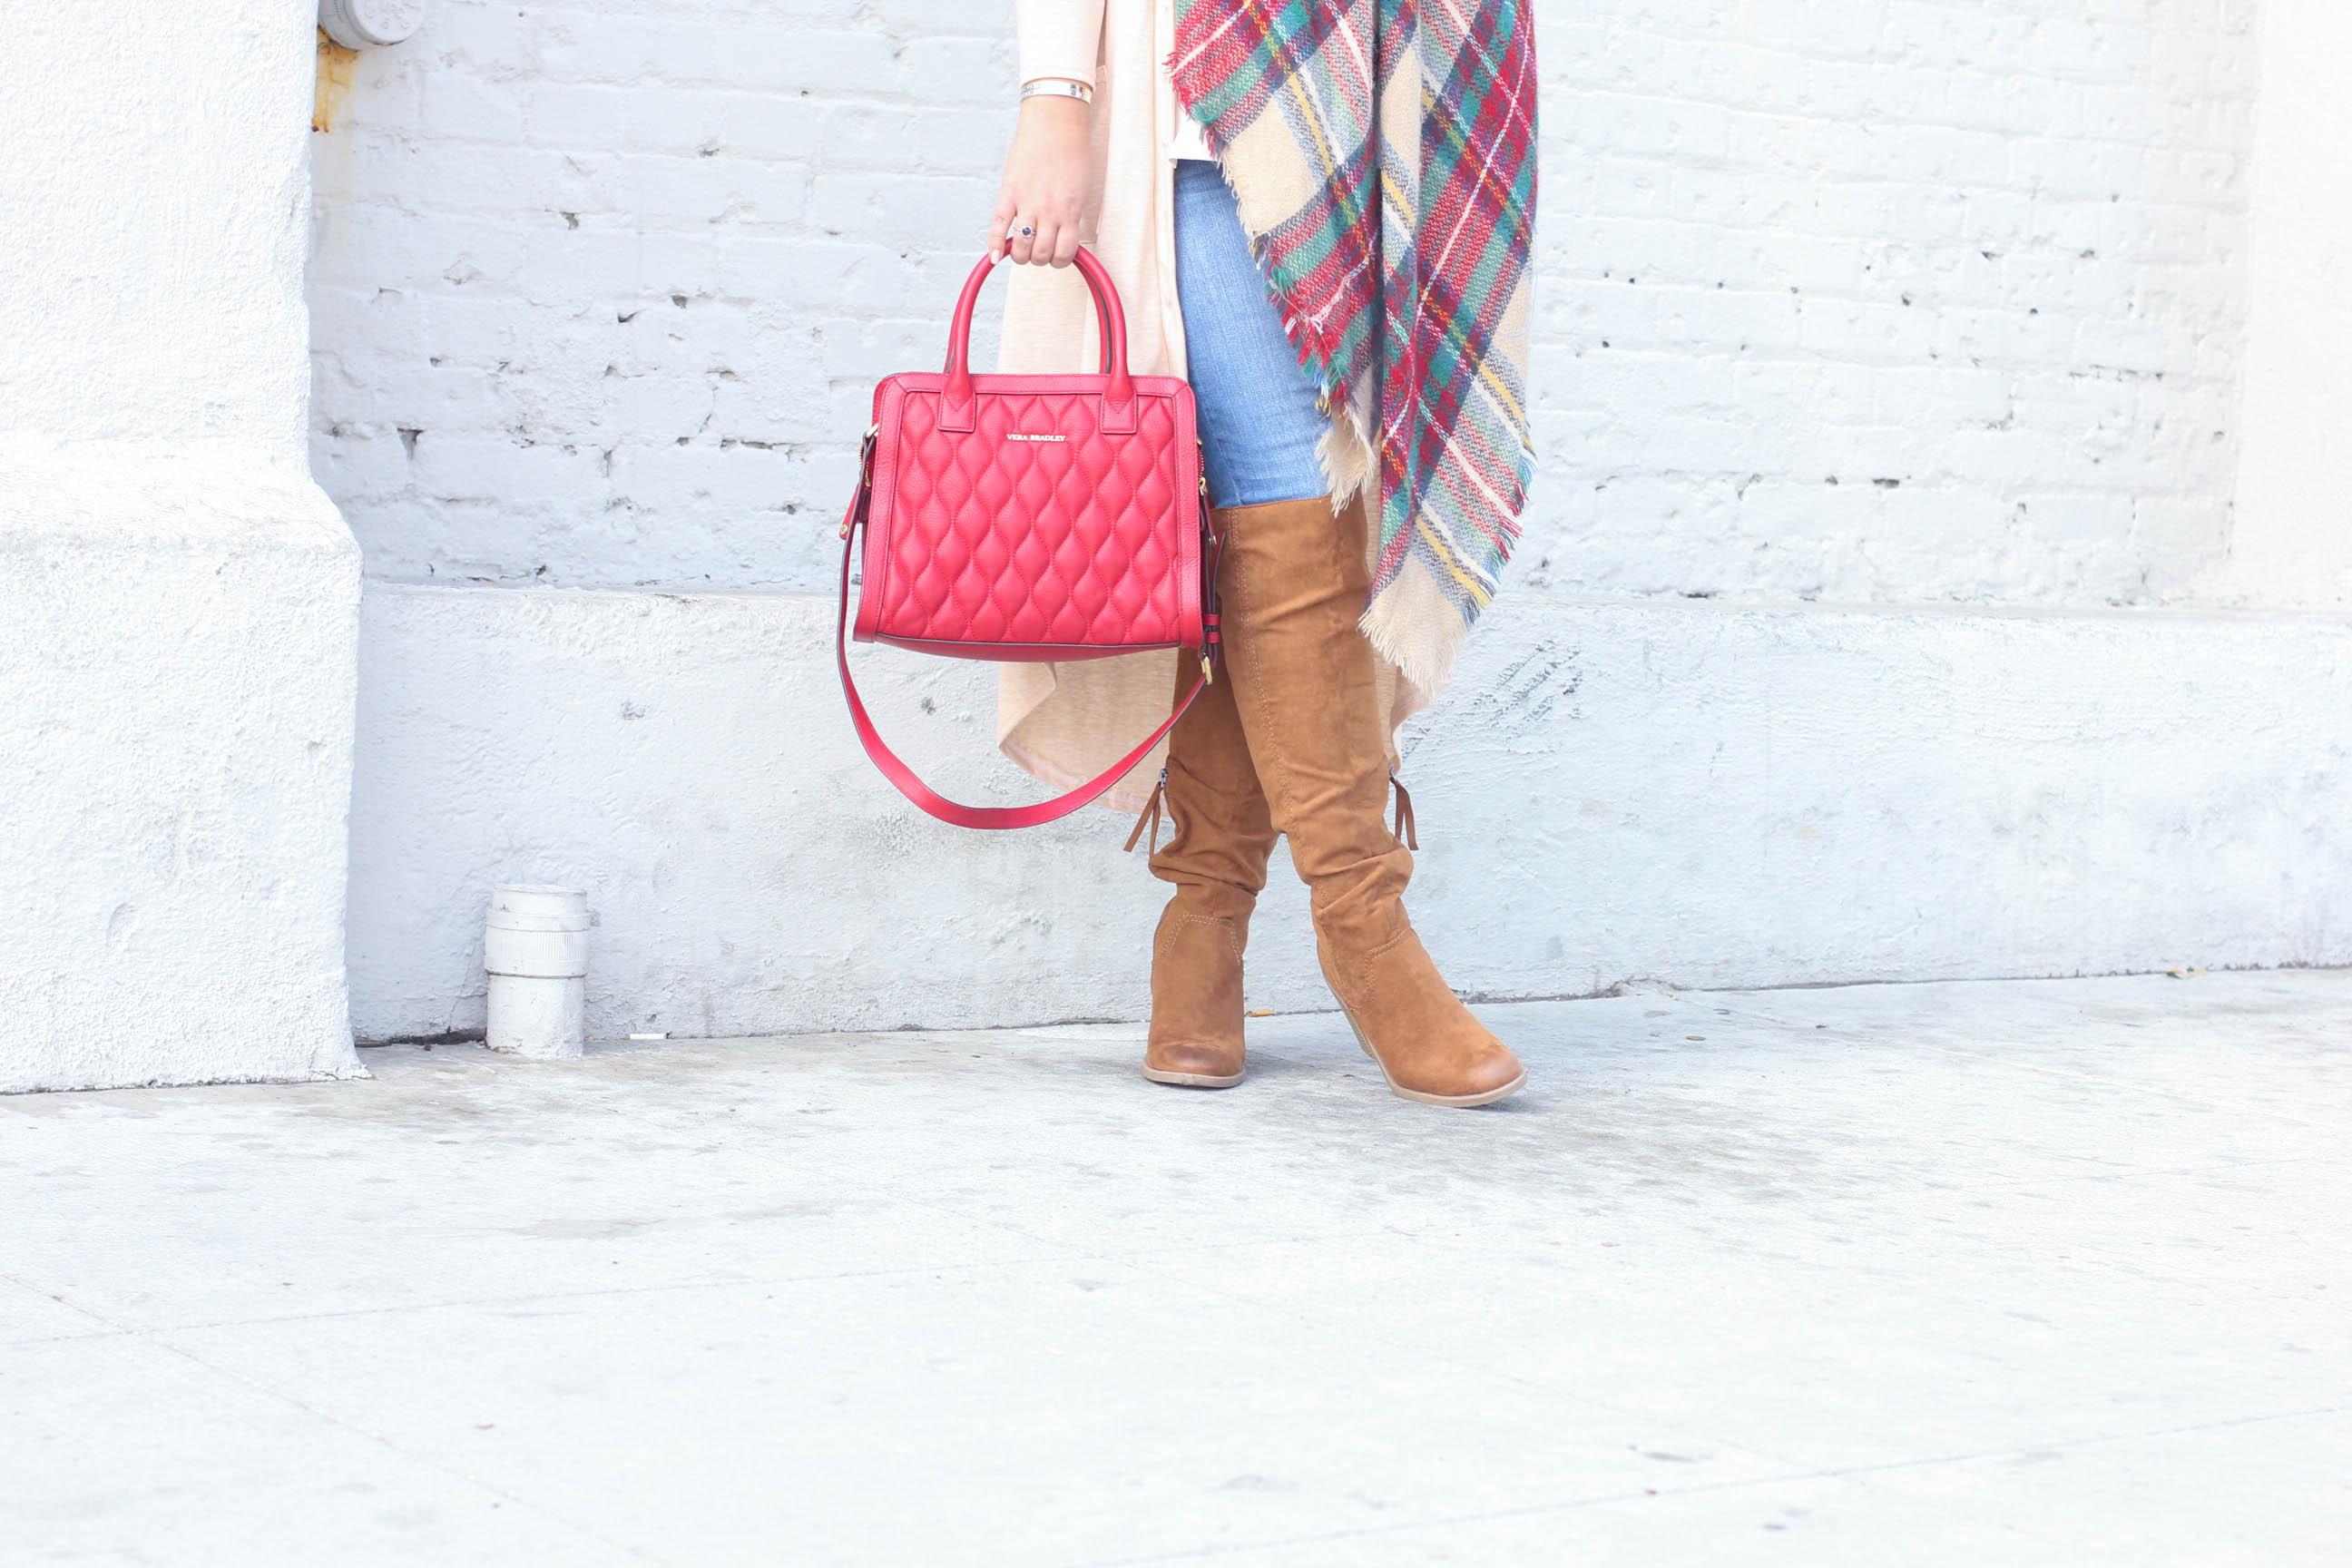 blanket scarf, how to wear a blanket scarf, la winter style, jeggings, mirrored sunglasses, silver sunglasses, red leather satchel, missyonmadison, missyonmadison instagram, fashion blogger, melissa tierney, winter style, la blogger, vera bradley, otk boots, target boots, target jeggings, target skinny jeans, white chiffon camisole, beige duster cardigan, beige cardigan,